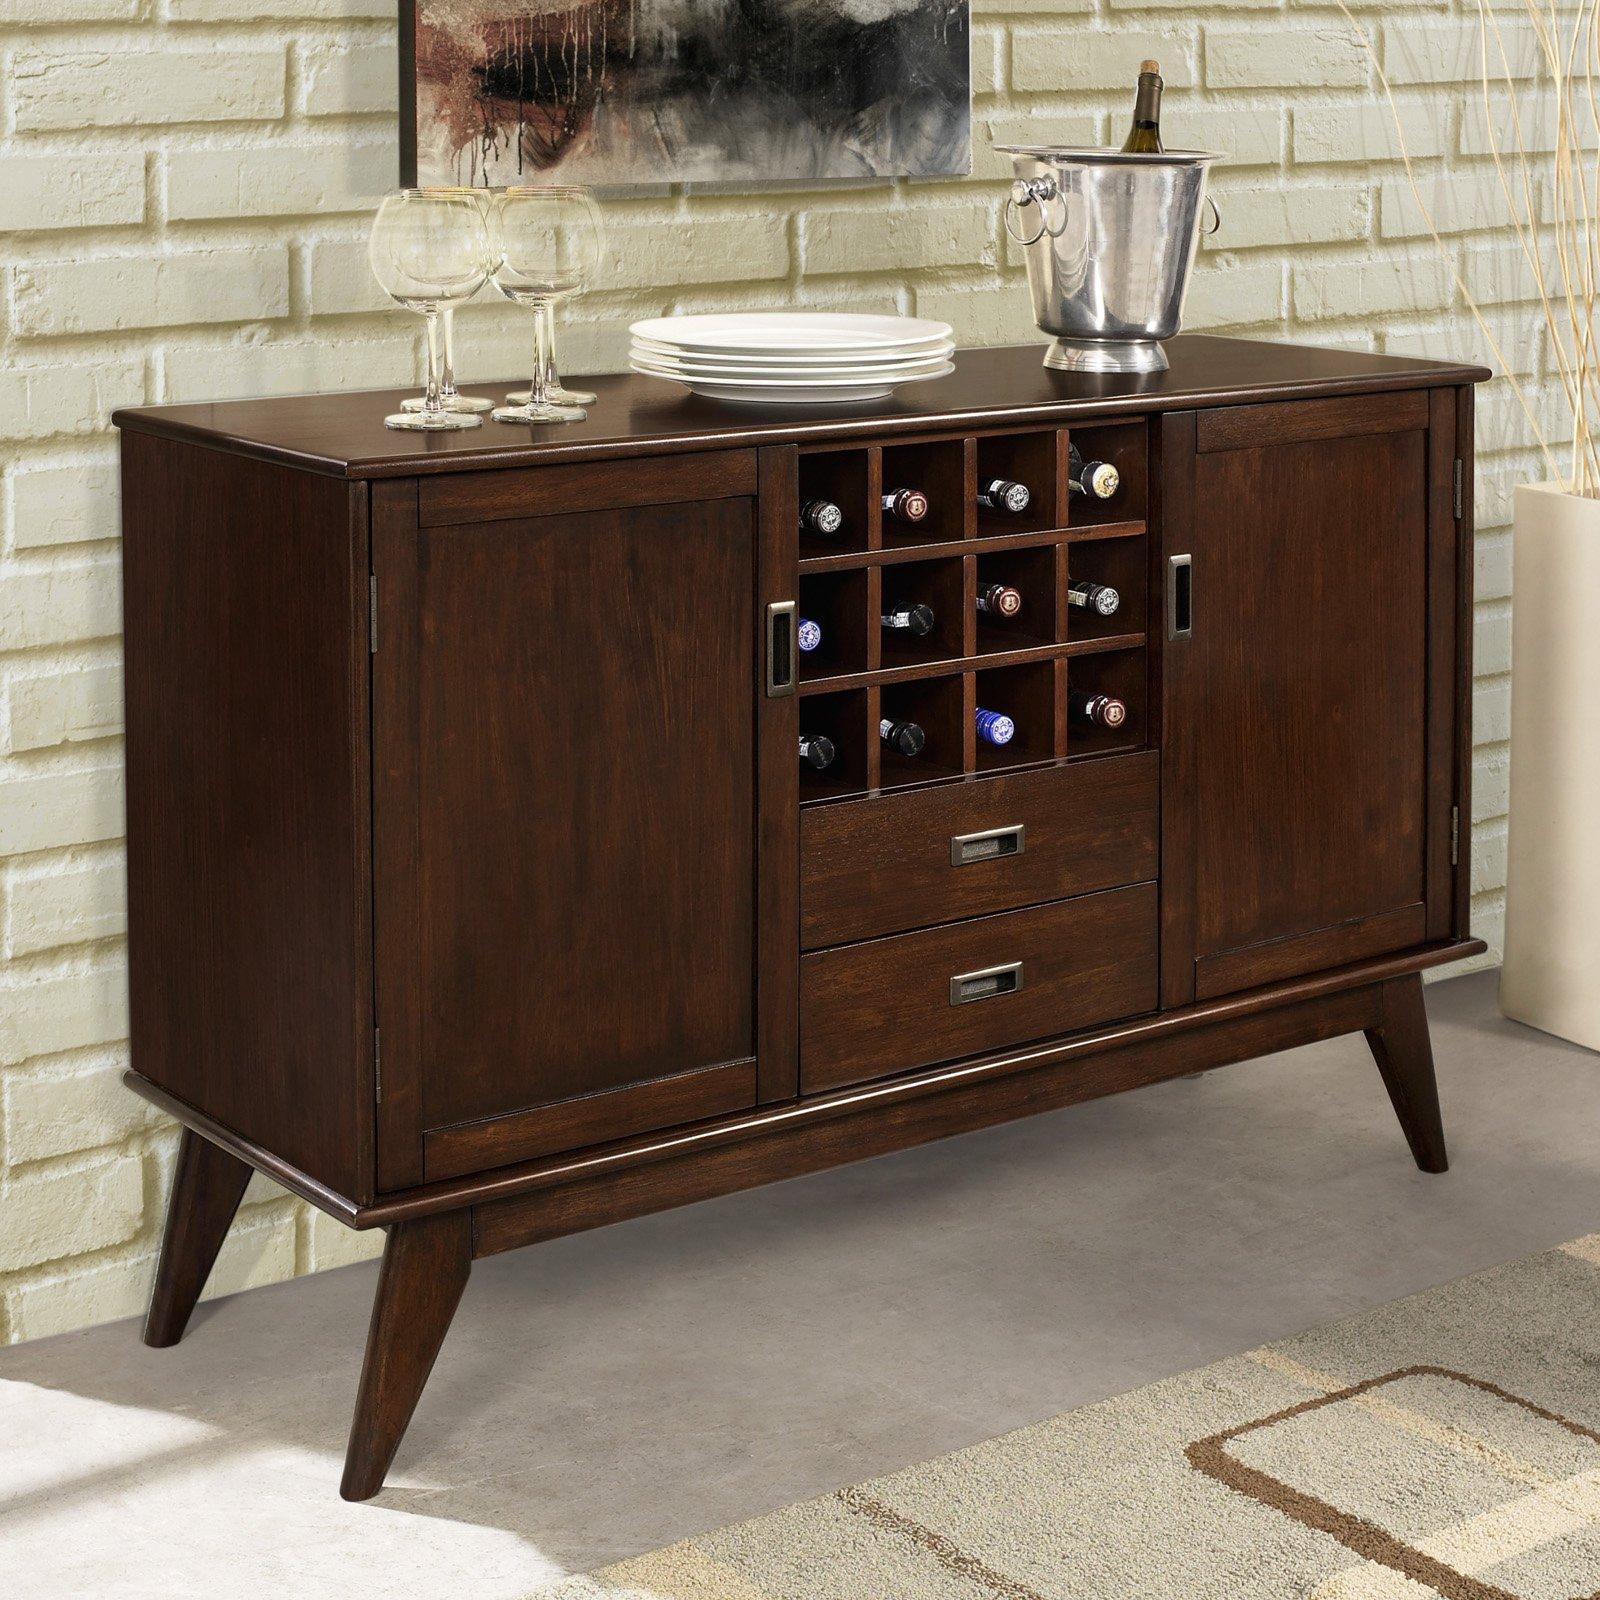 Simpli Home Draper Mid Century Sideboard Buffet Winerack